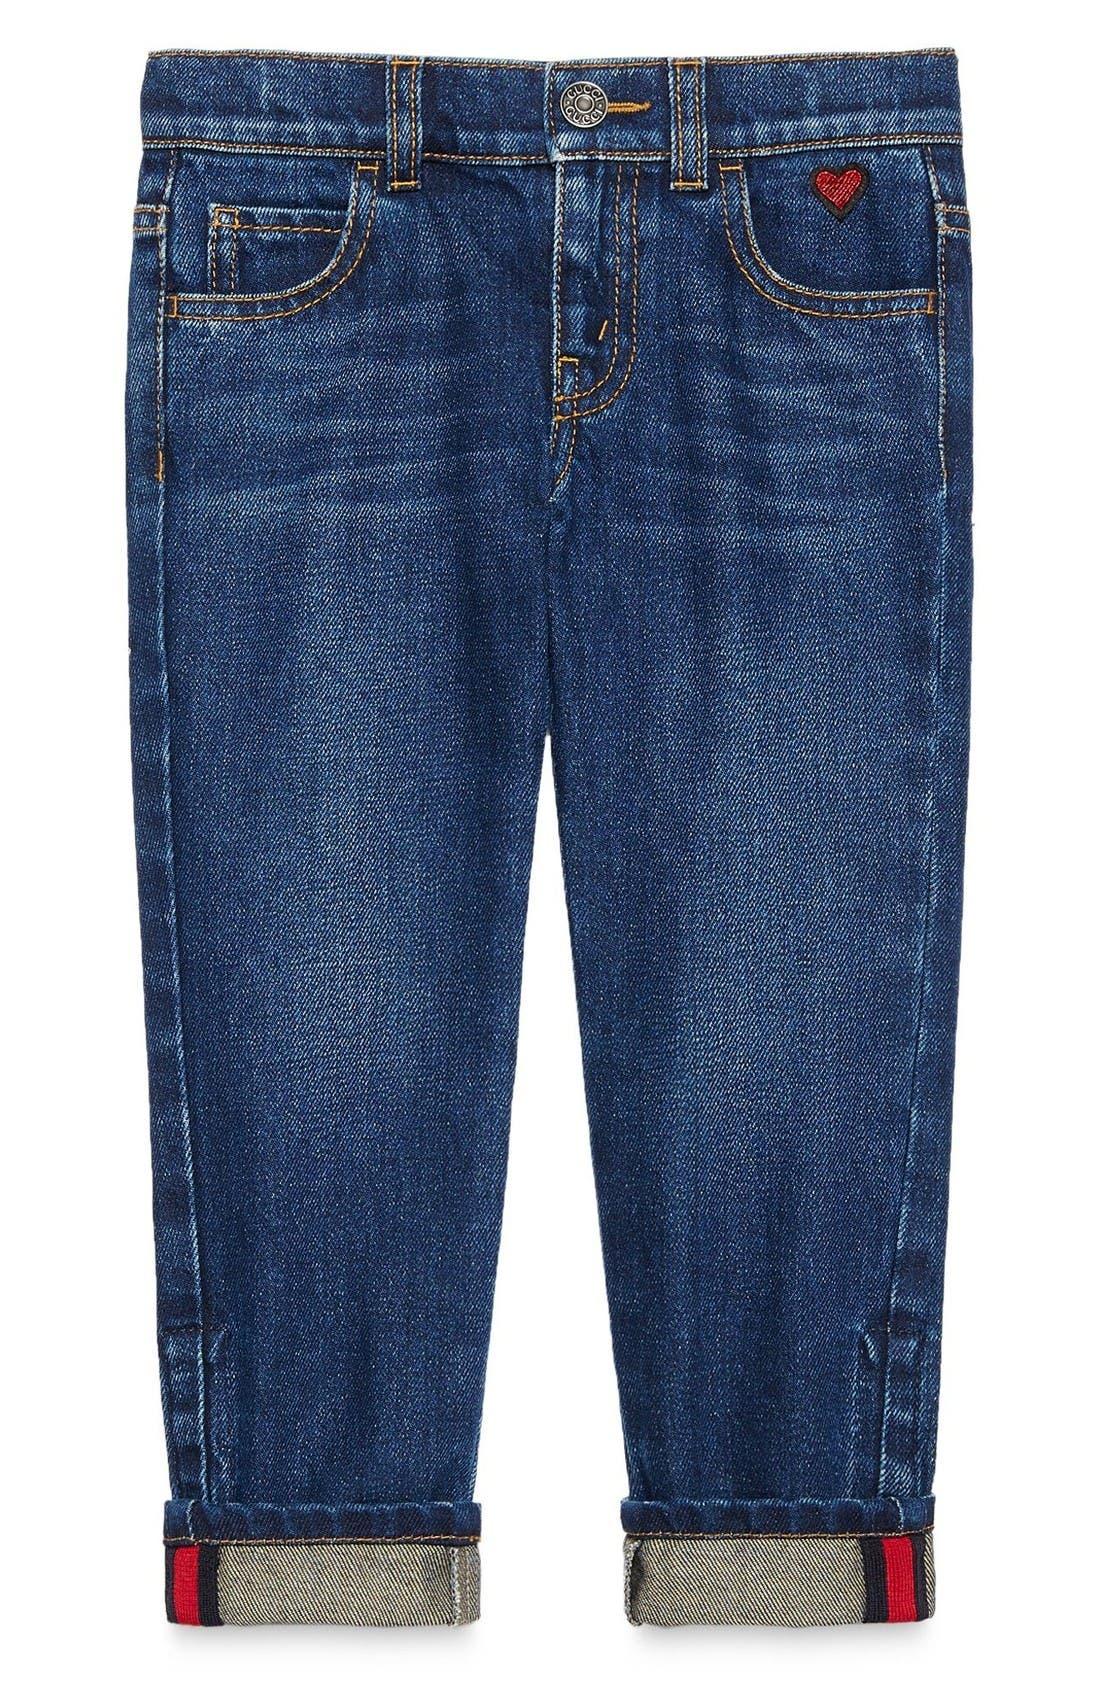 Gucci Cuffed Jeans (Little Girls & Big Girls)